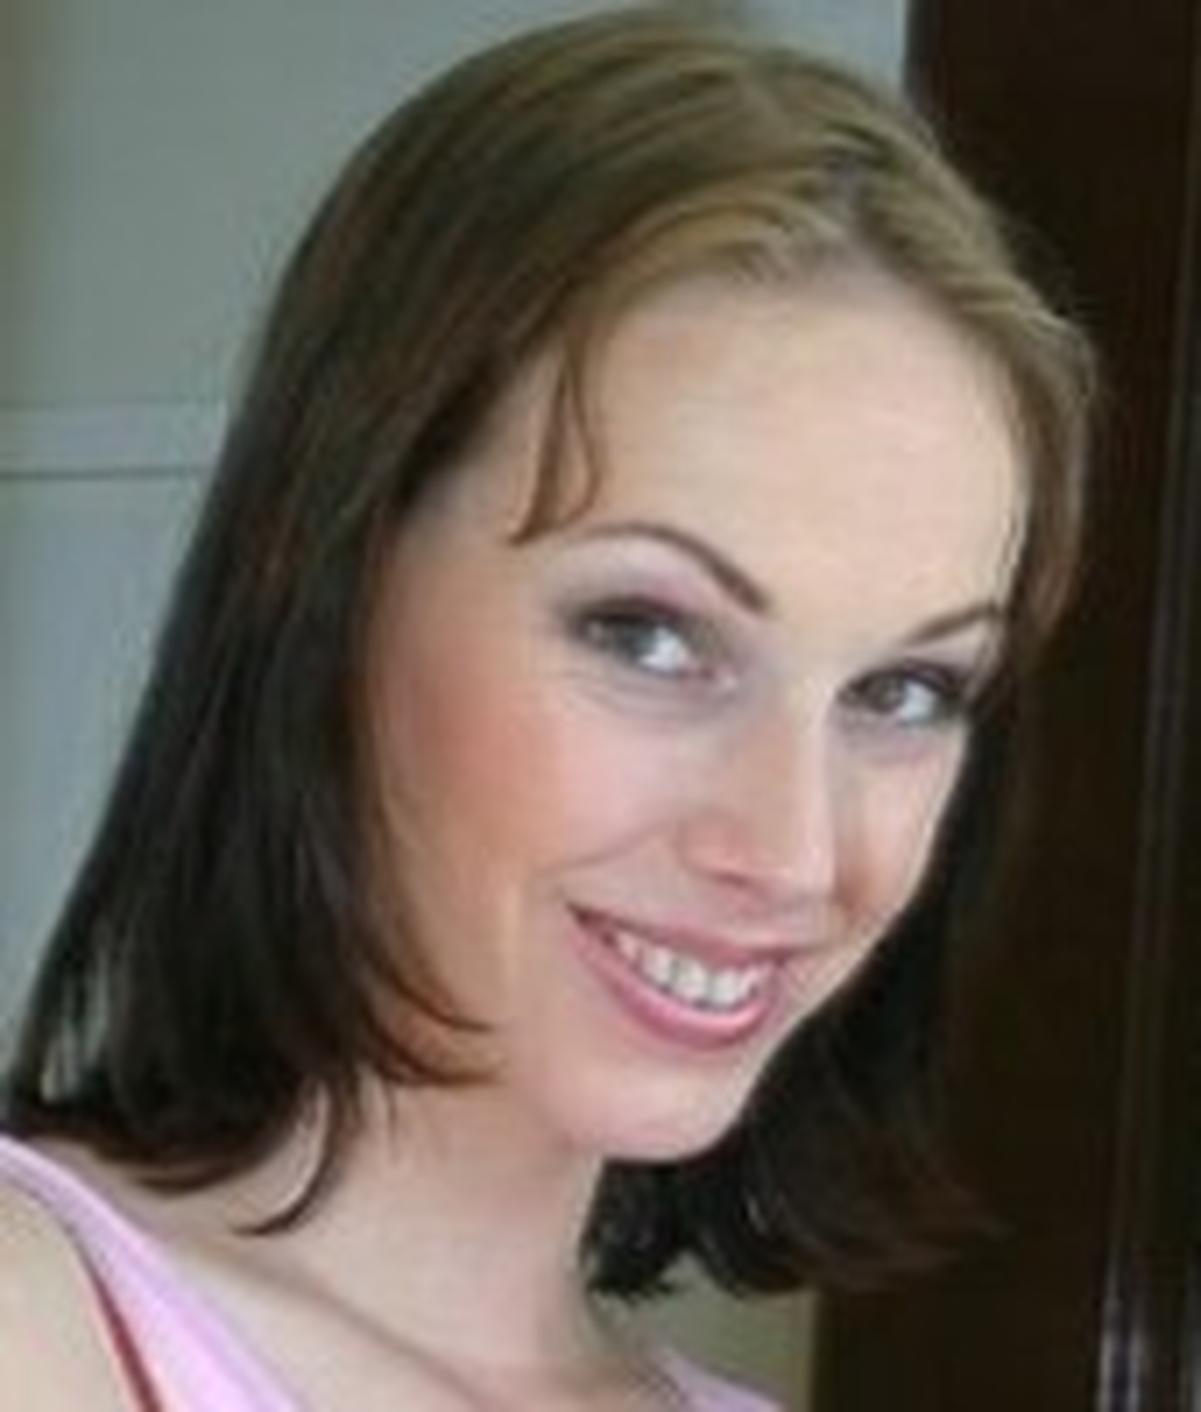 Rita Neri Wiki & Bio - Pornographic Actress